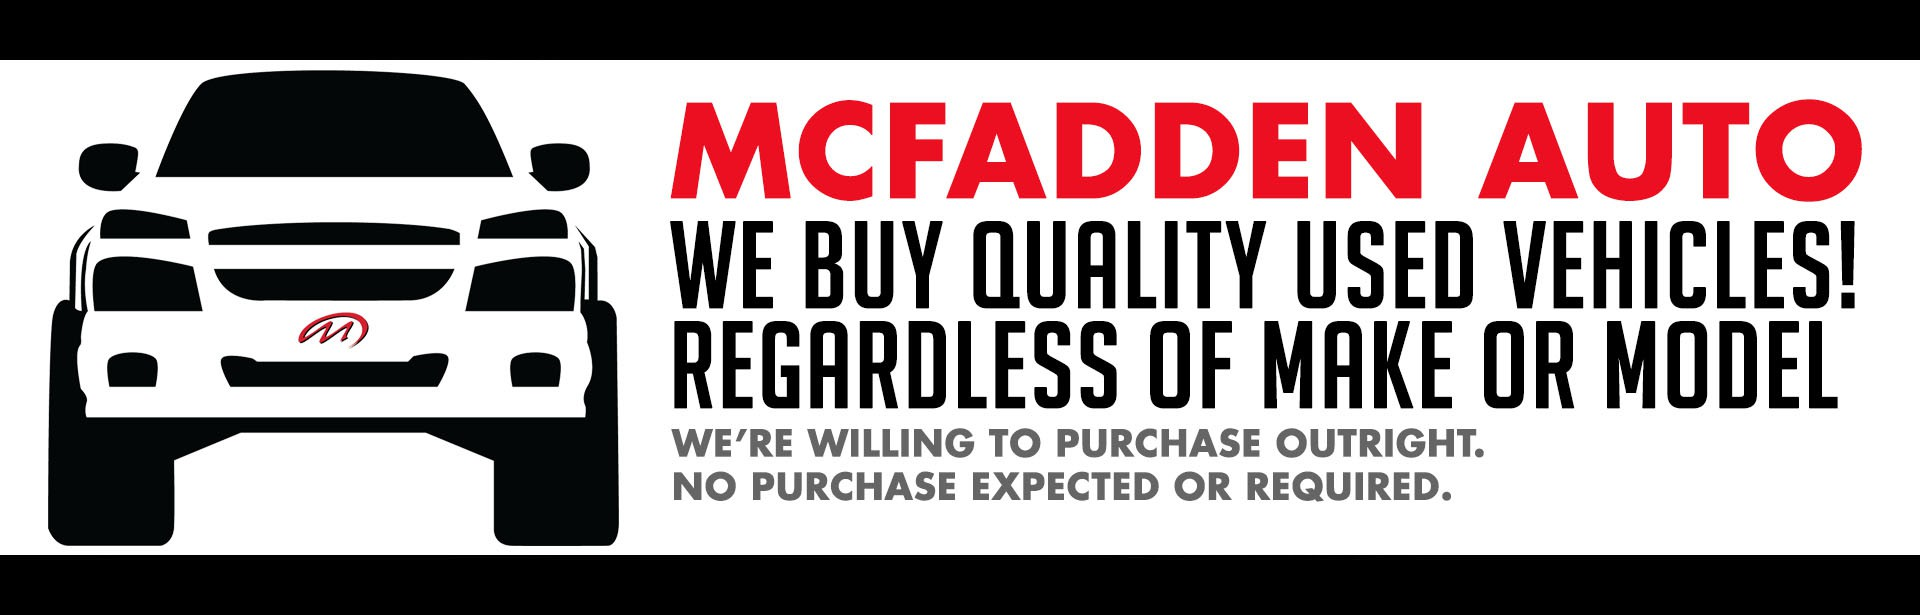 McFadden Auto - We buy used Vehicles - Nov 2017